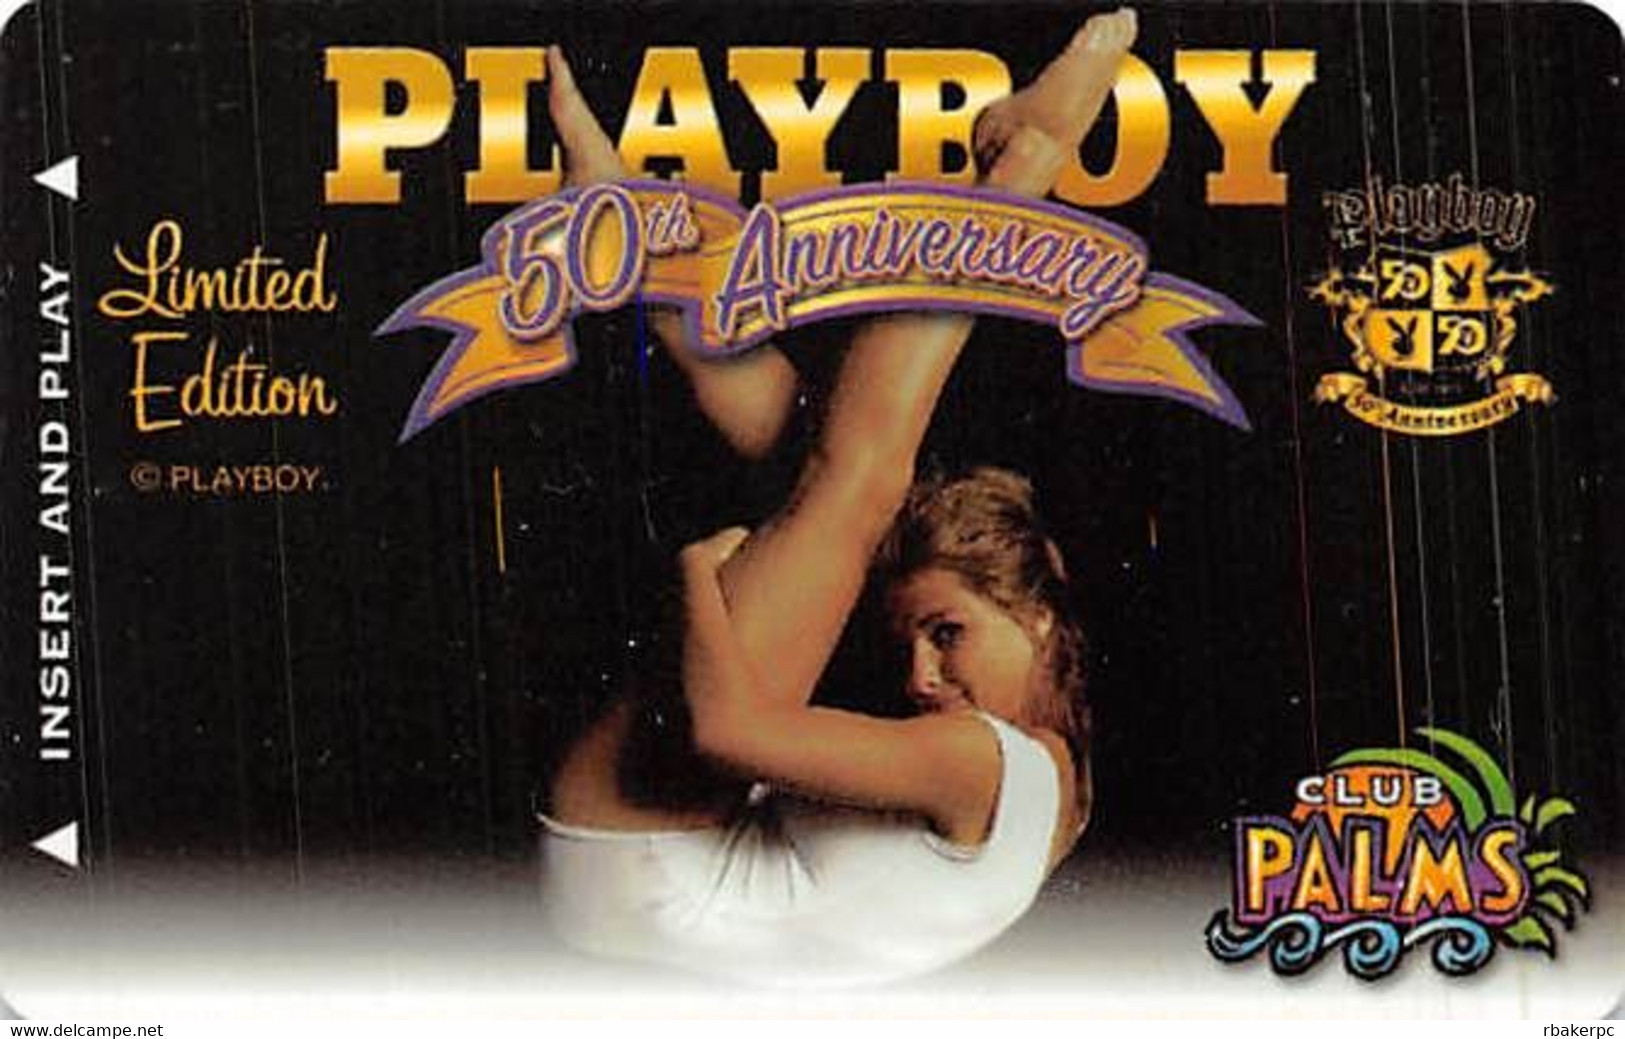 Palms Casino - Las Vegas NV - BLANK Playboy Ltd Ed. Slot Card - Casino Cards